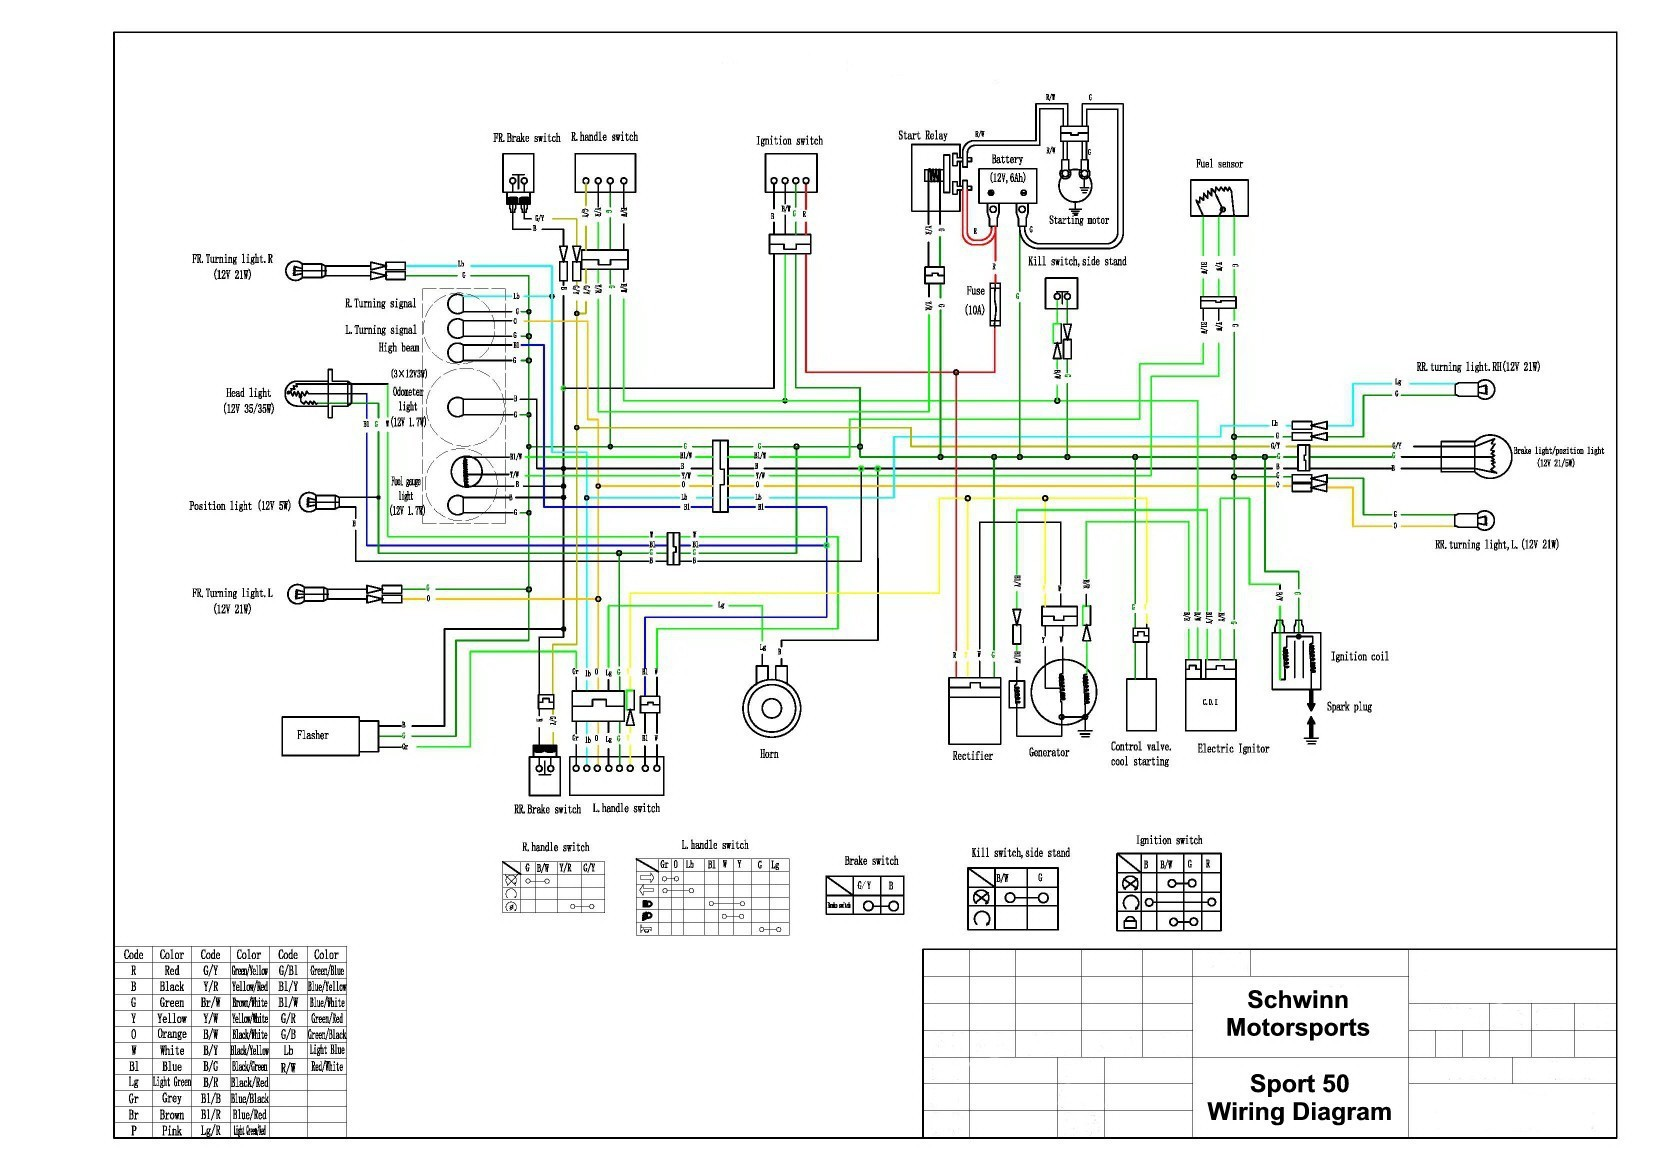 linhai 260 wiring diagram schematic wiring diagram u2022 rh freewiring  today linhai 260 scooter wiring diagram